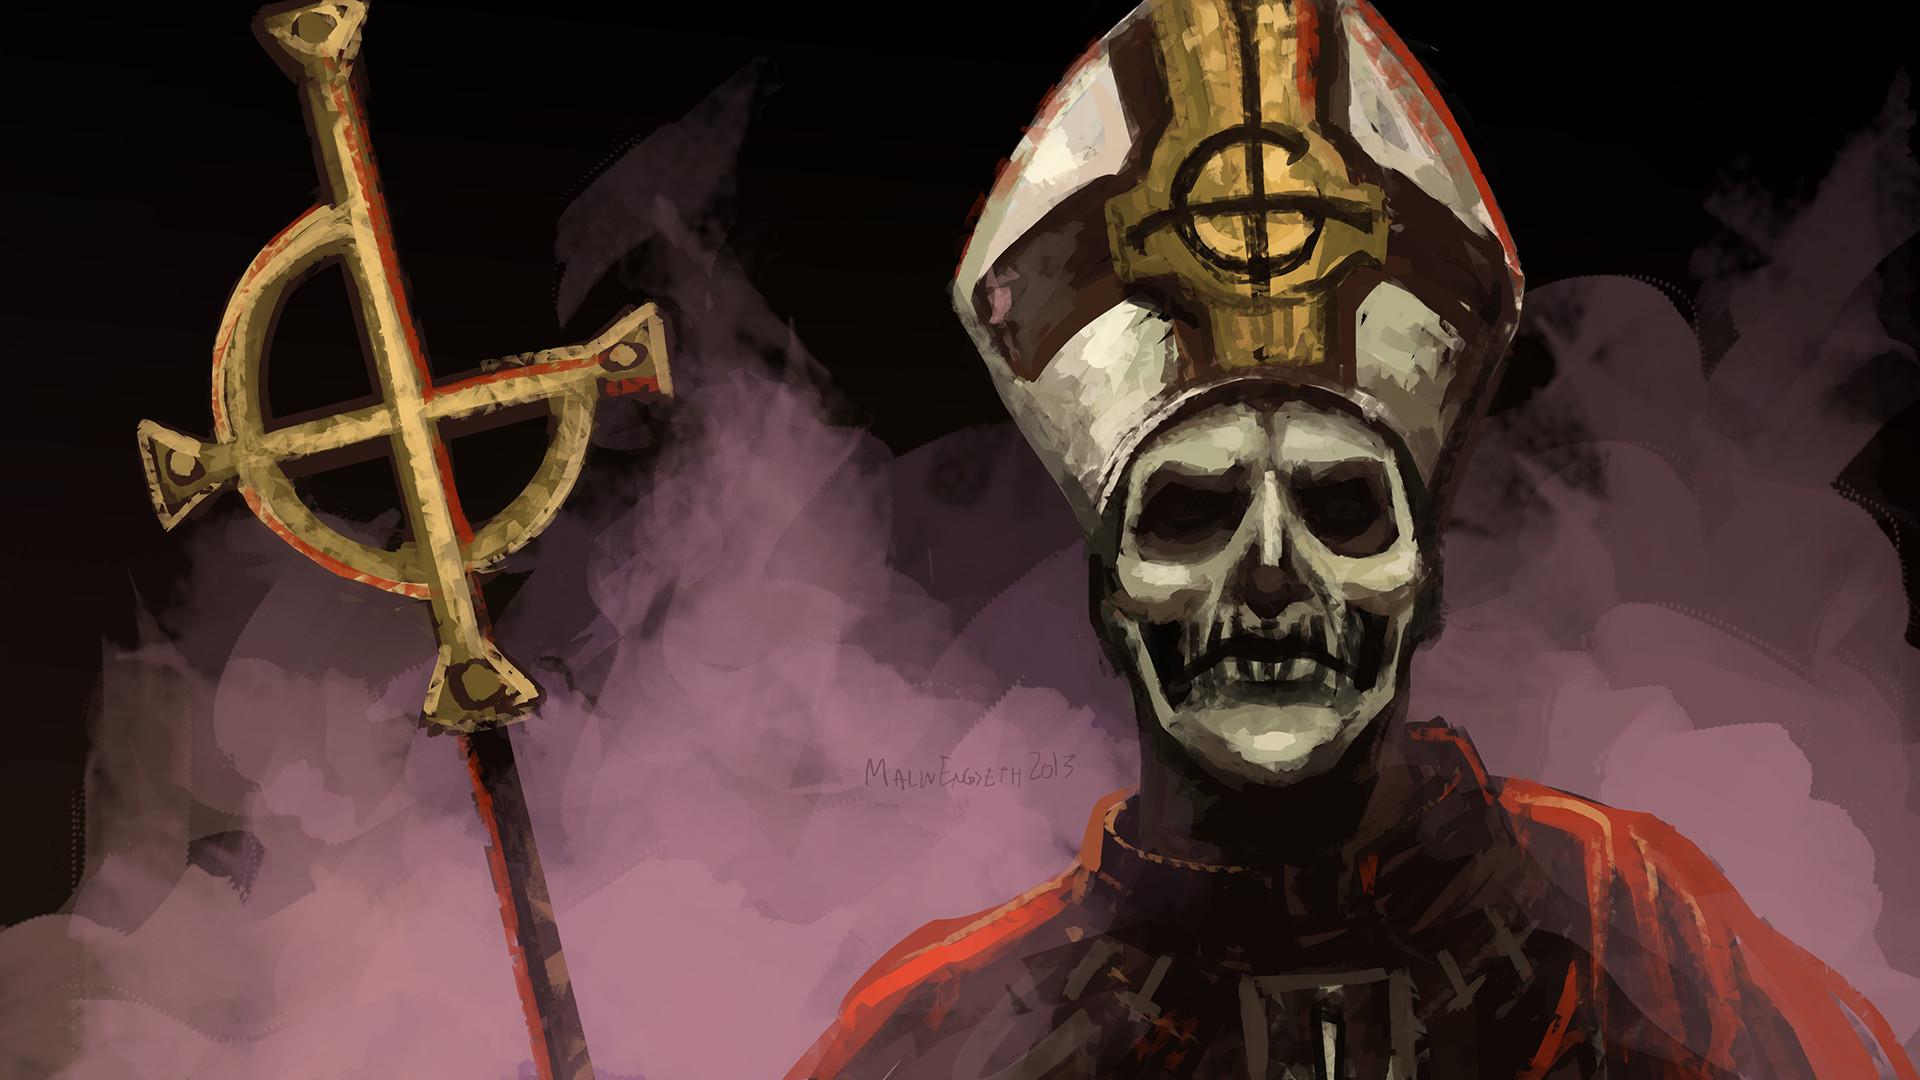 Ghost B_C heavy metal black death dark f wallpaper | | 136534 |  WallpaperUP